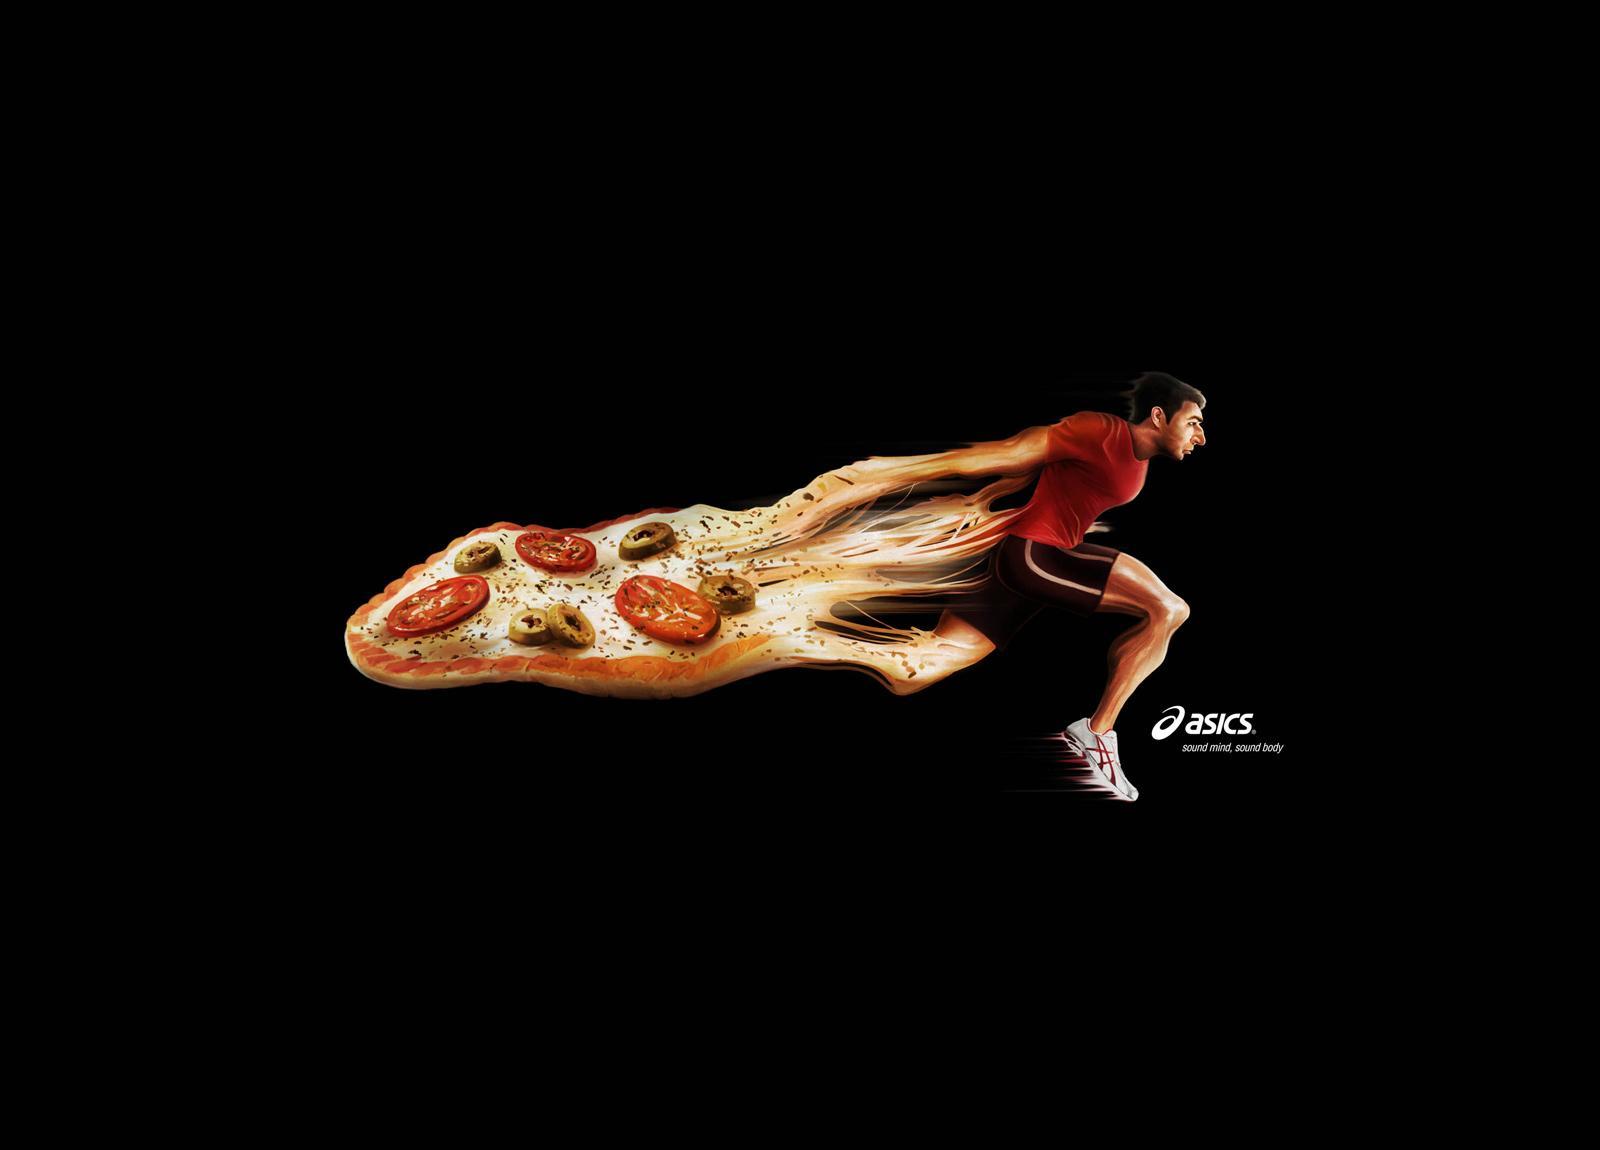 ASICS Print Ad -  Pizza